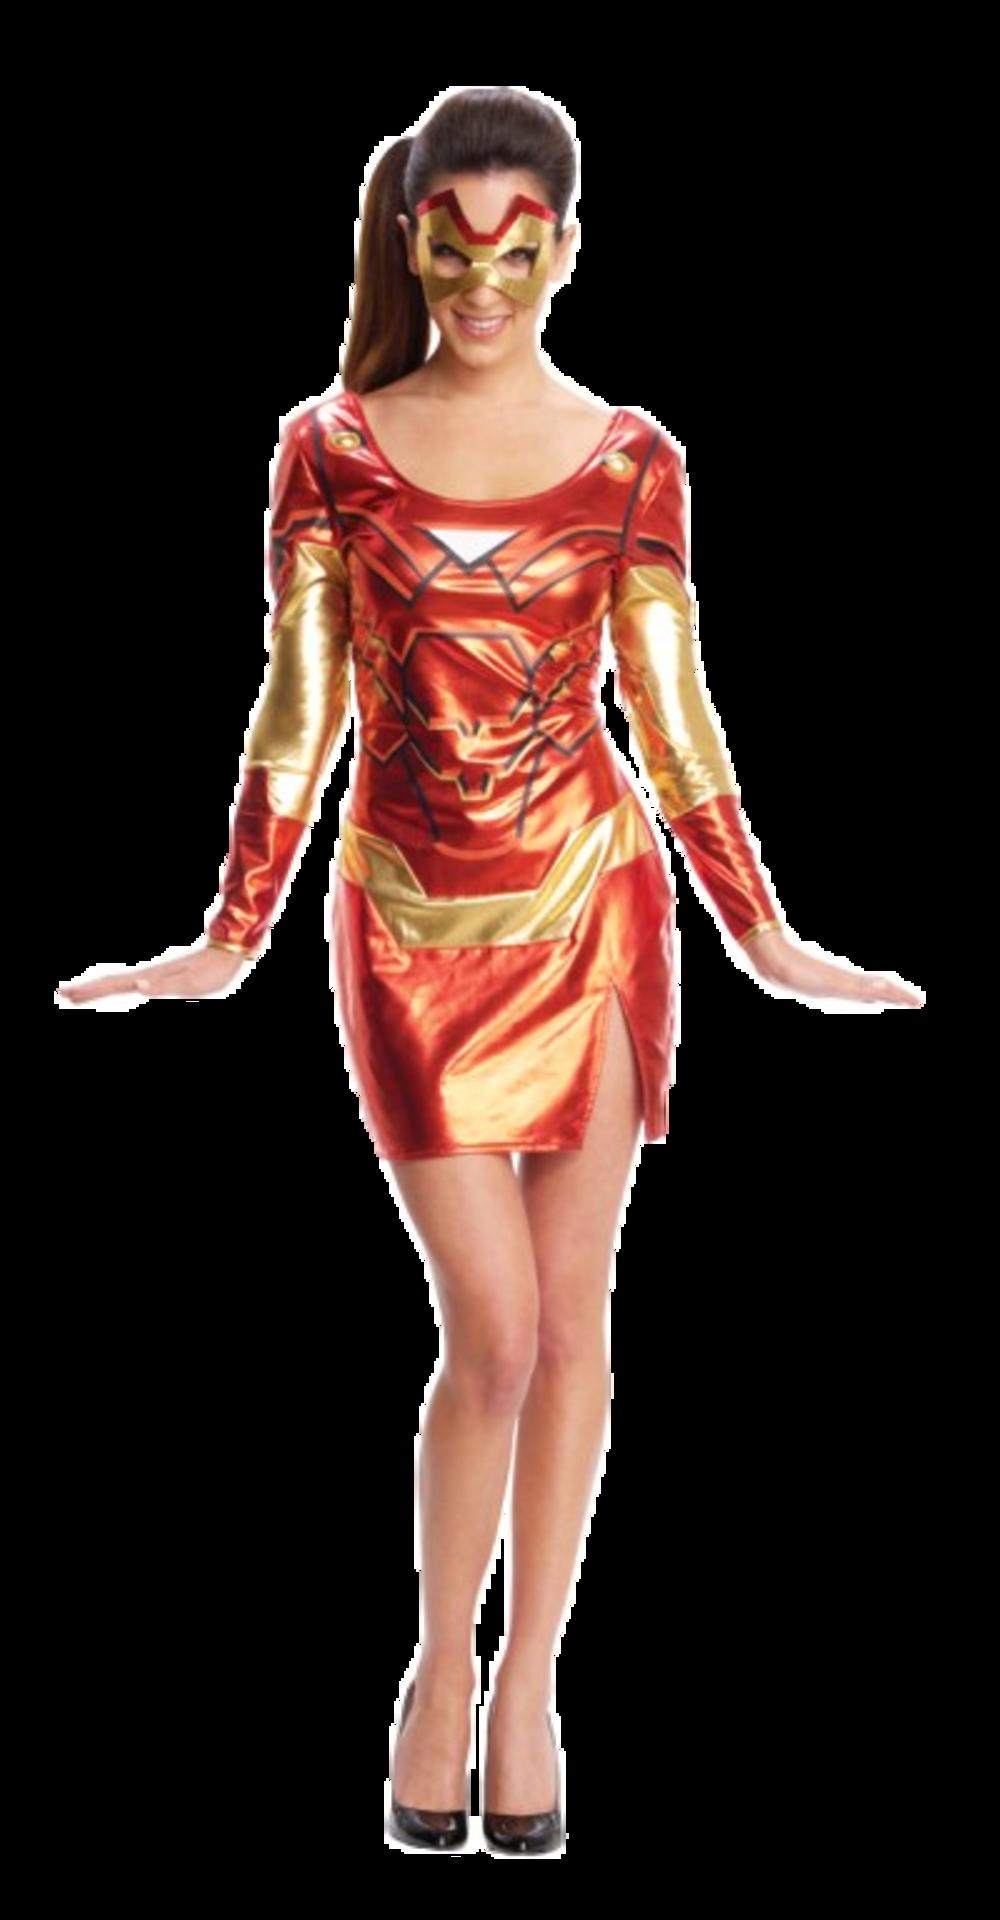 Miss Ironman Costume